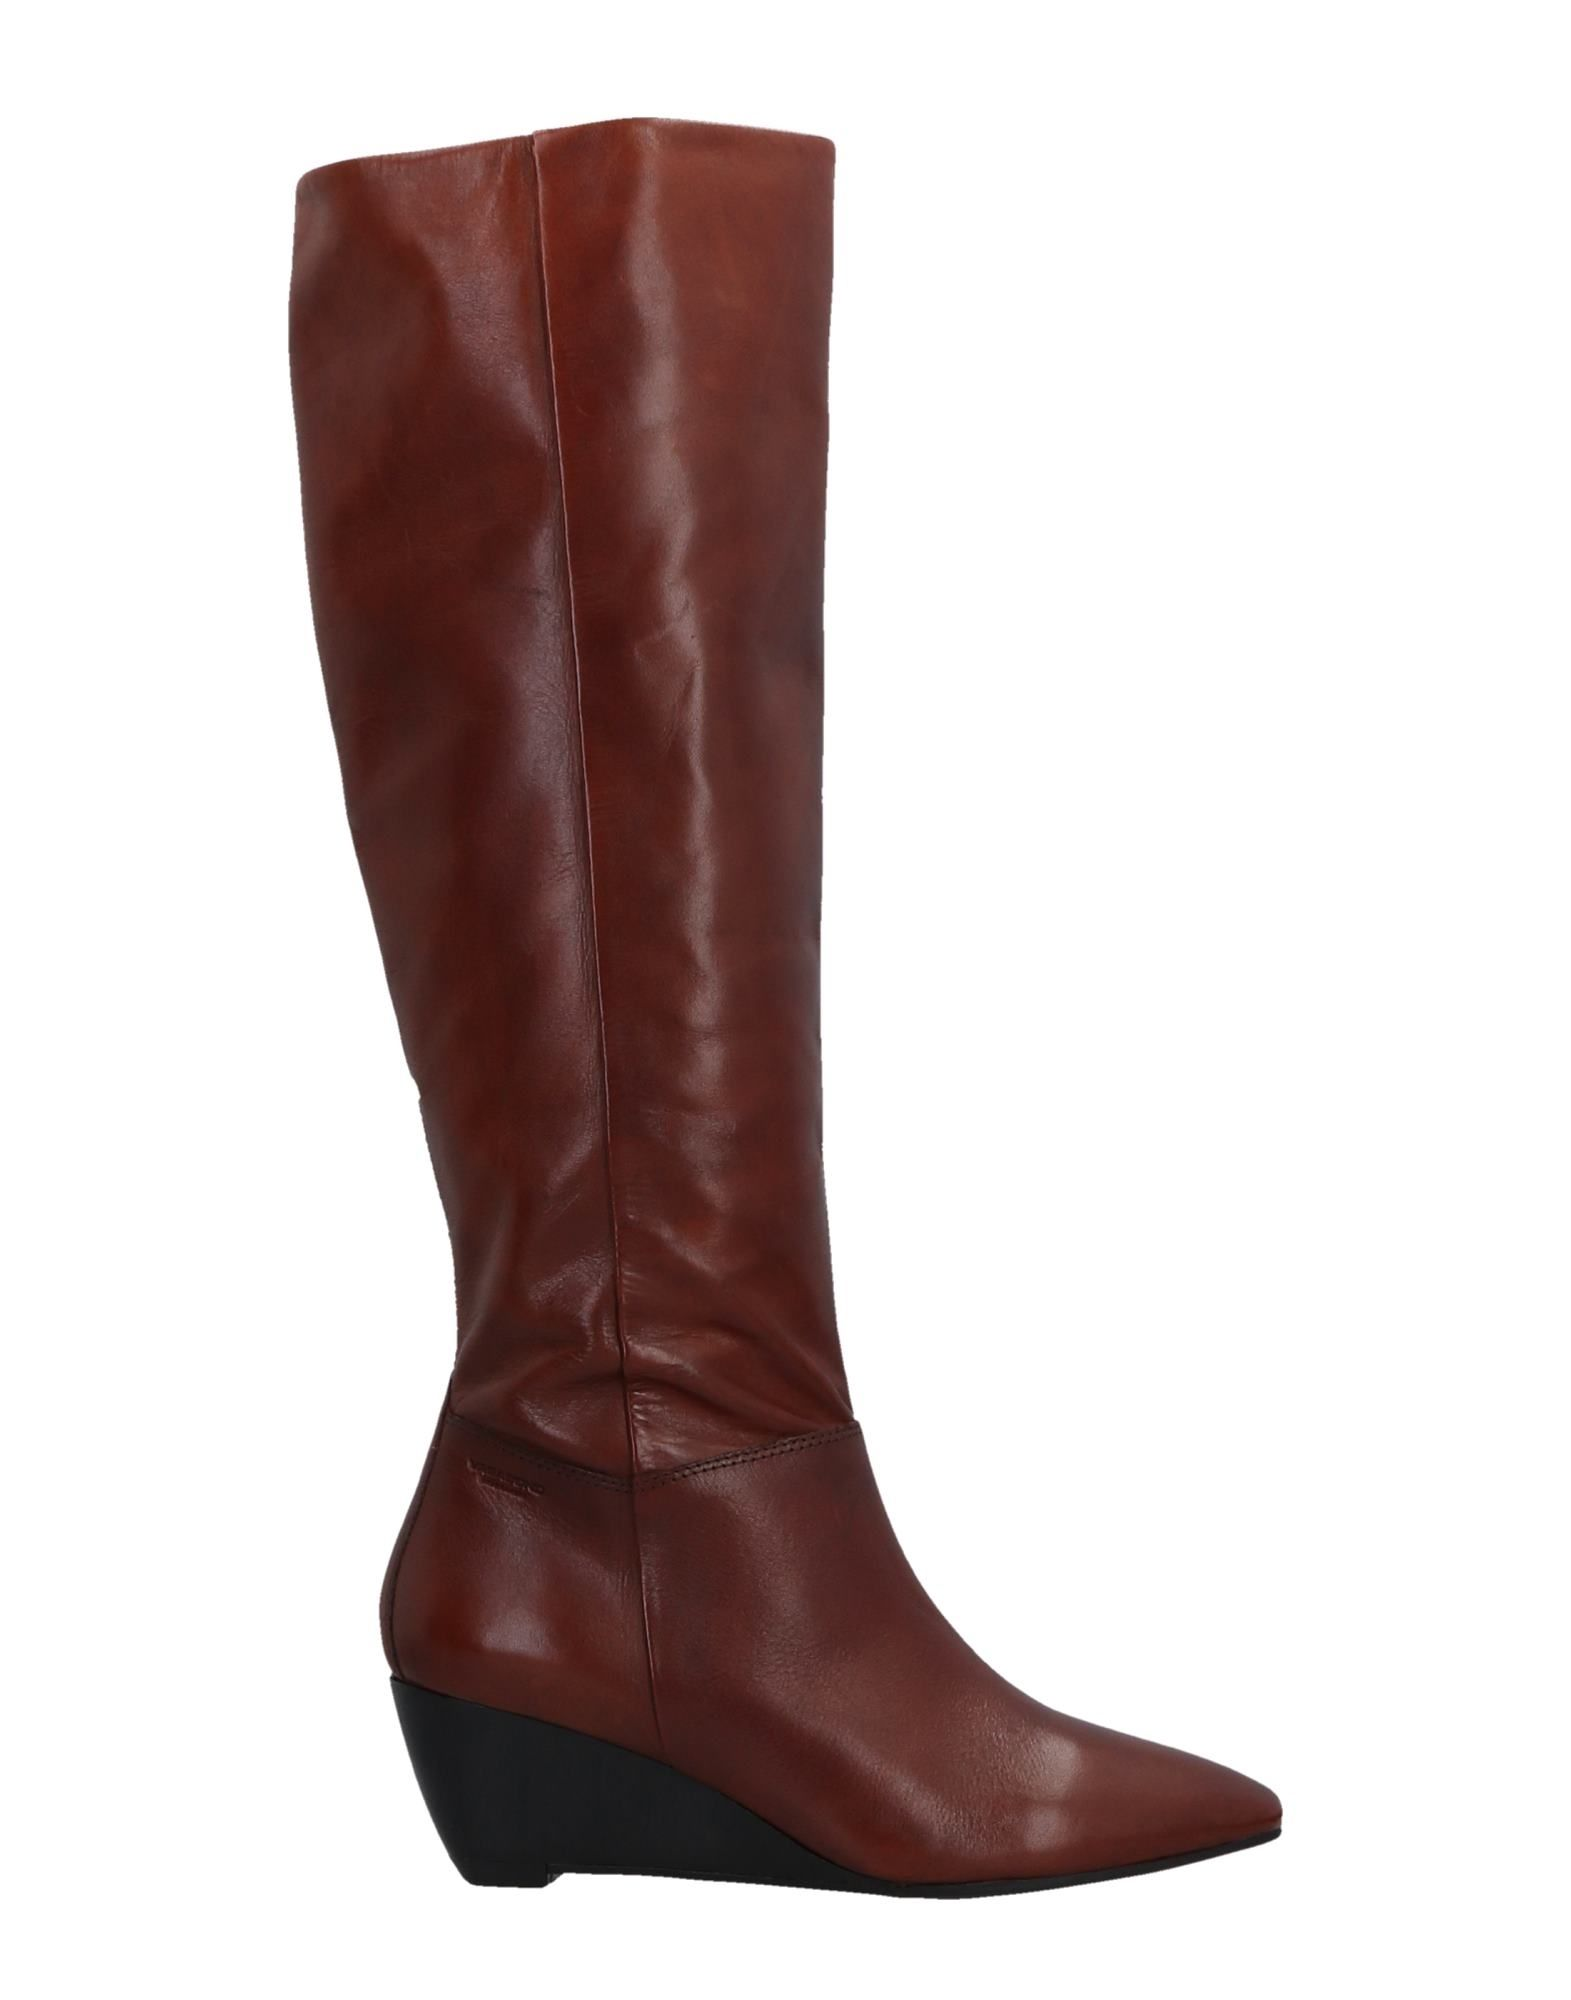 Vagabond Shoemakers Stiefel Damen  11513101KT